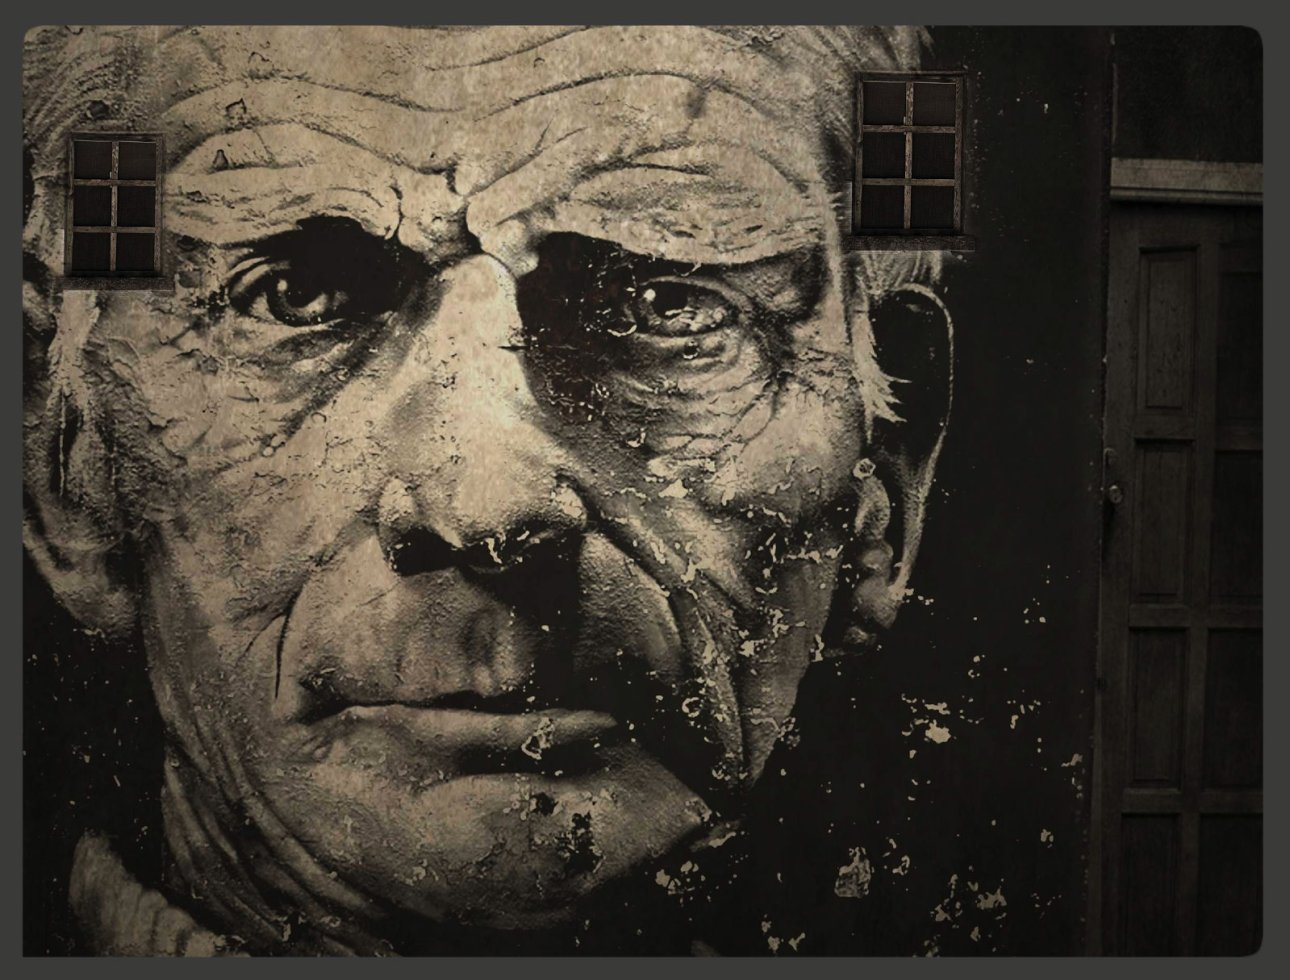 [E.M. Cioran] Samuel Beckett üzerine 1